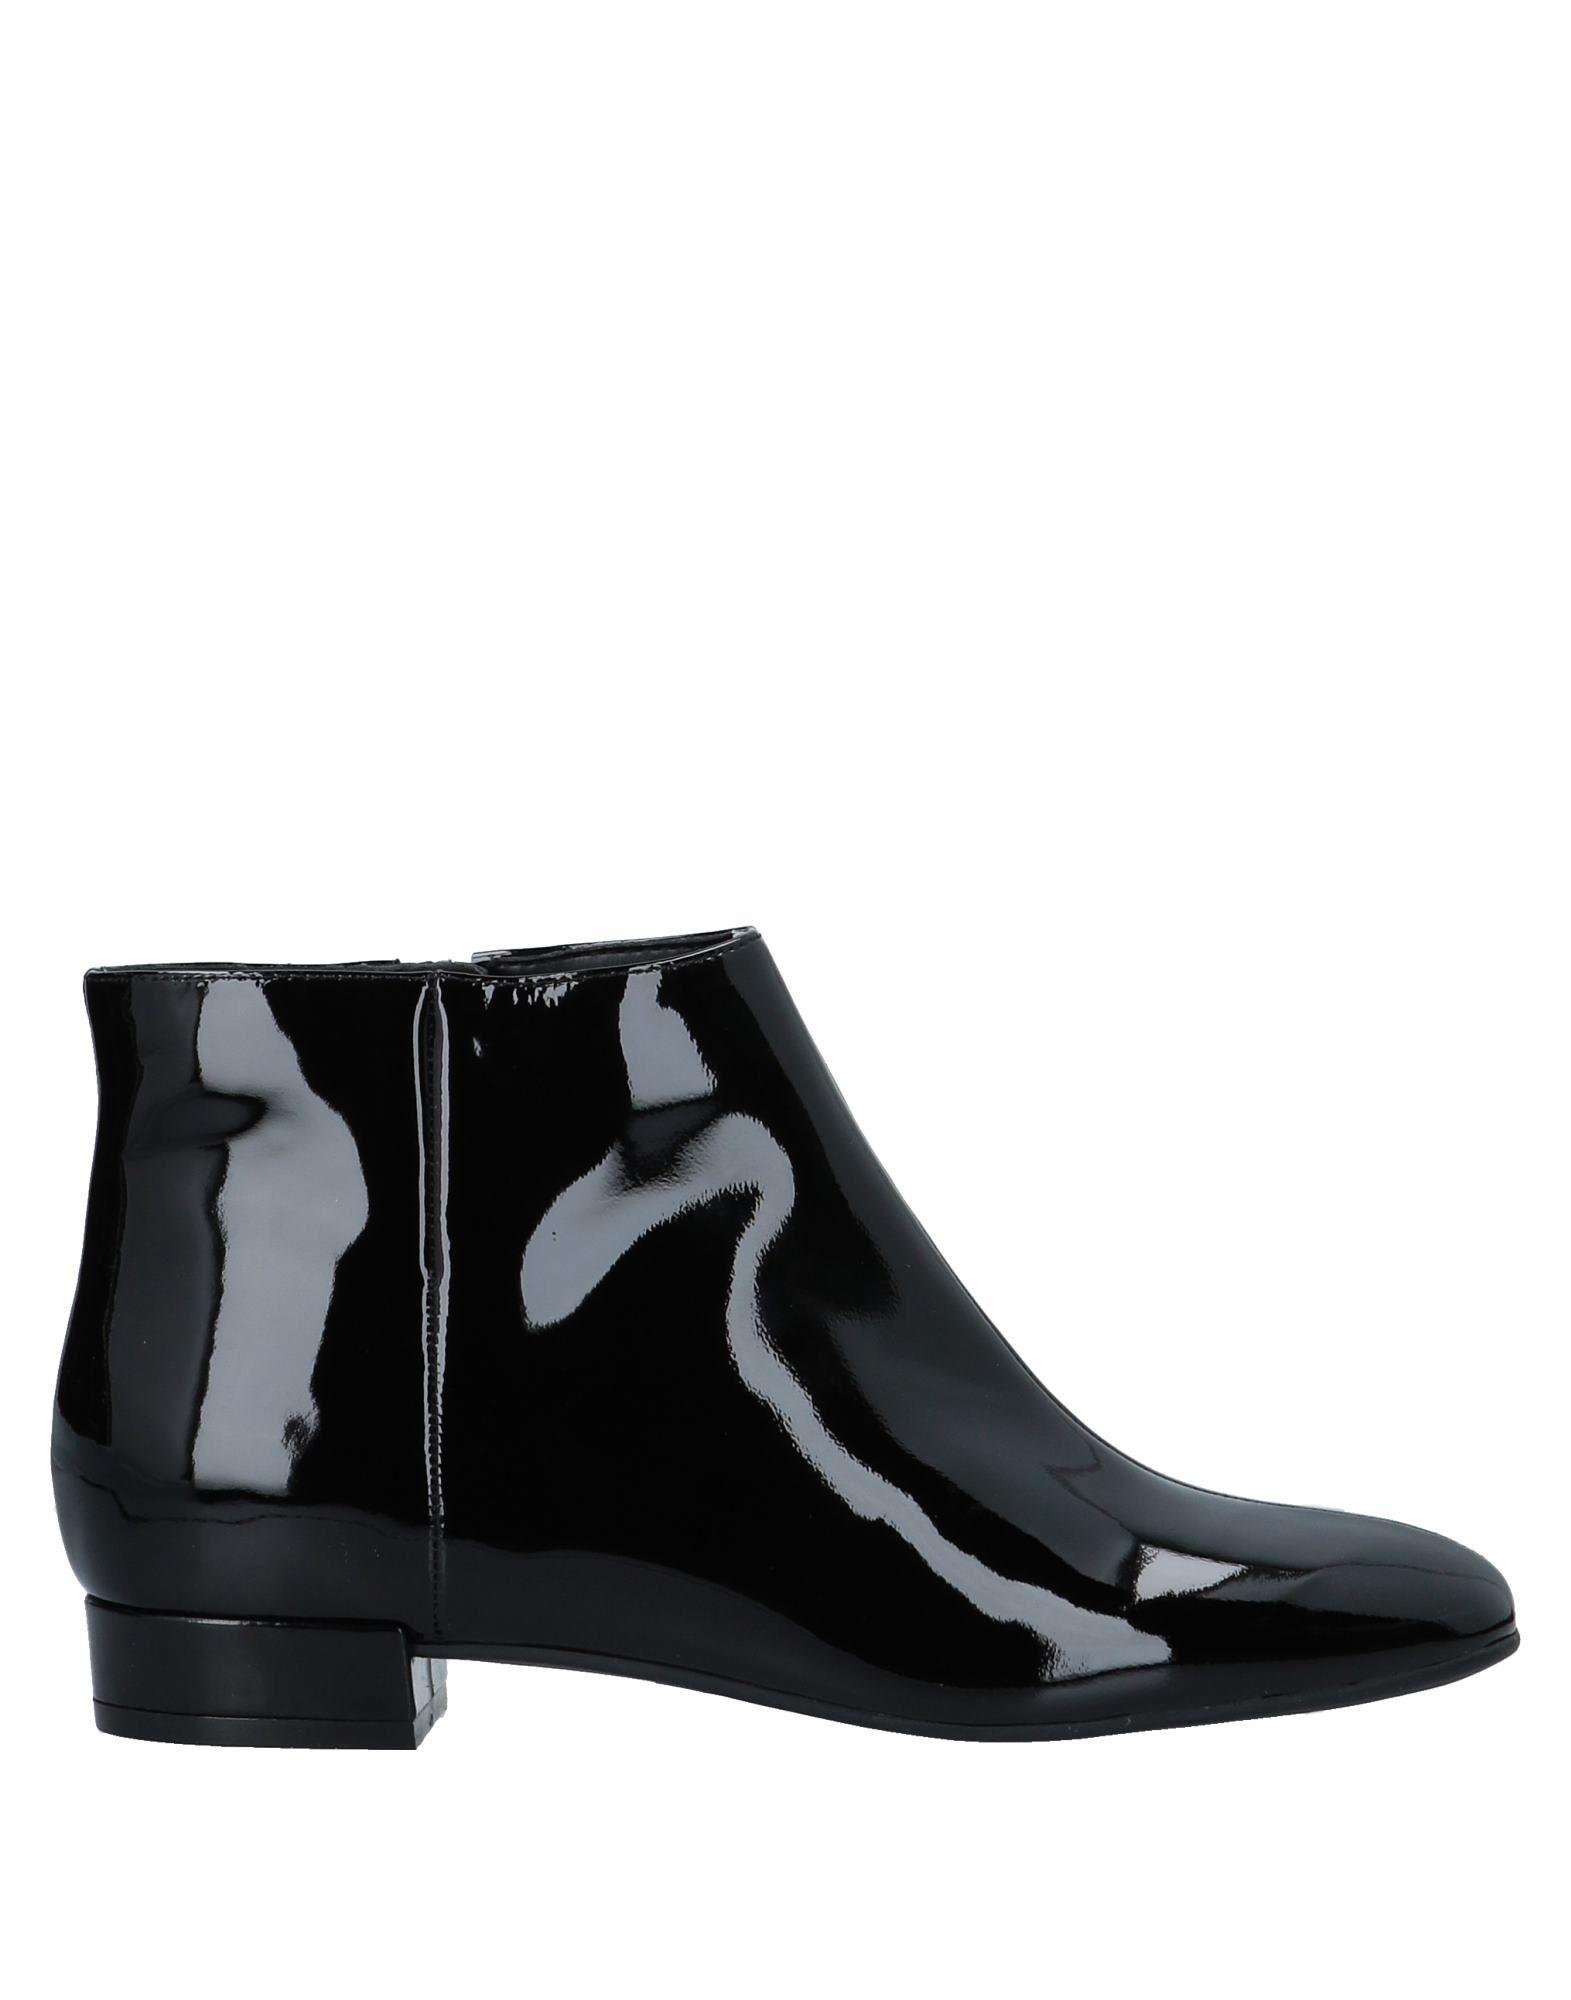 Stilvolle billige Stiefelette Schuhe Karl Lagerfeld Stiefelette billige Damen  11542585IU 0089c7